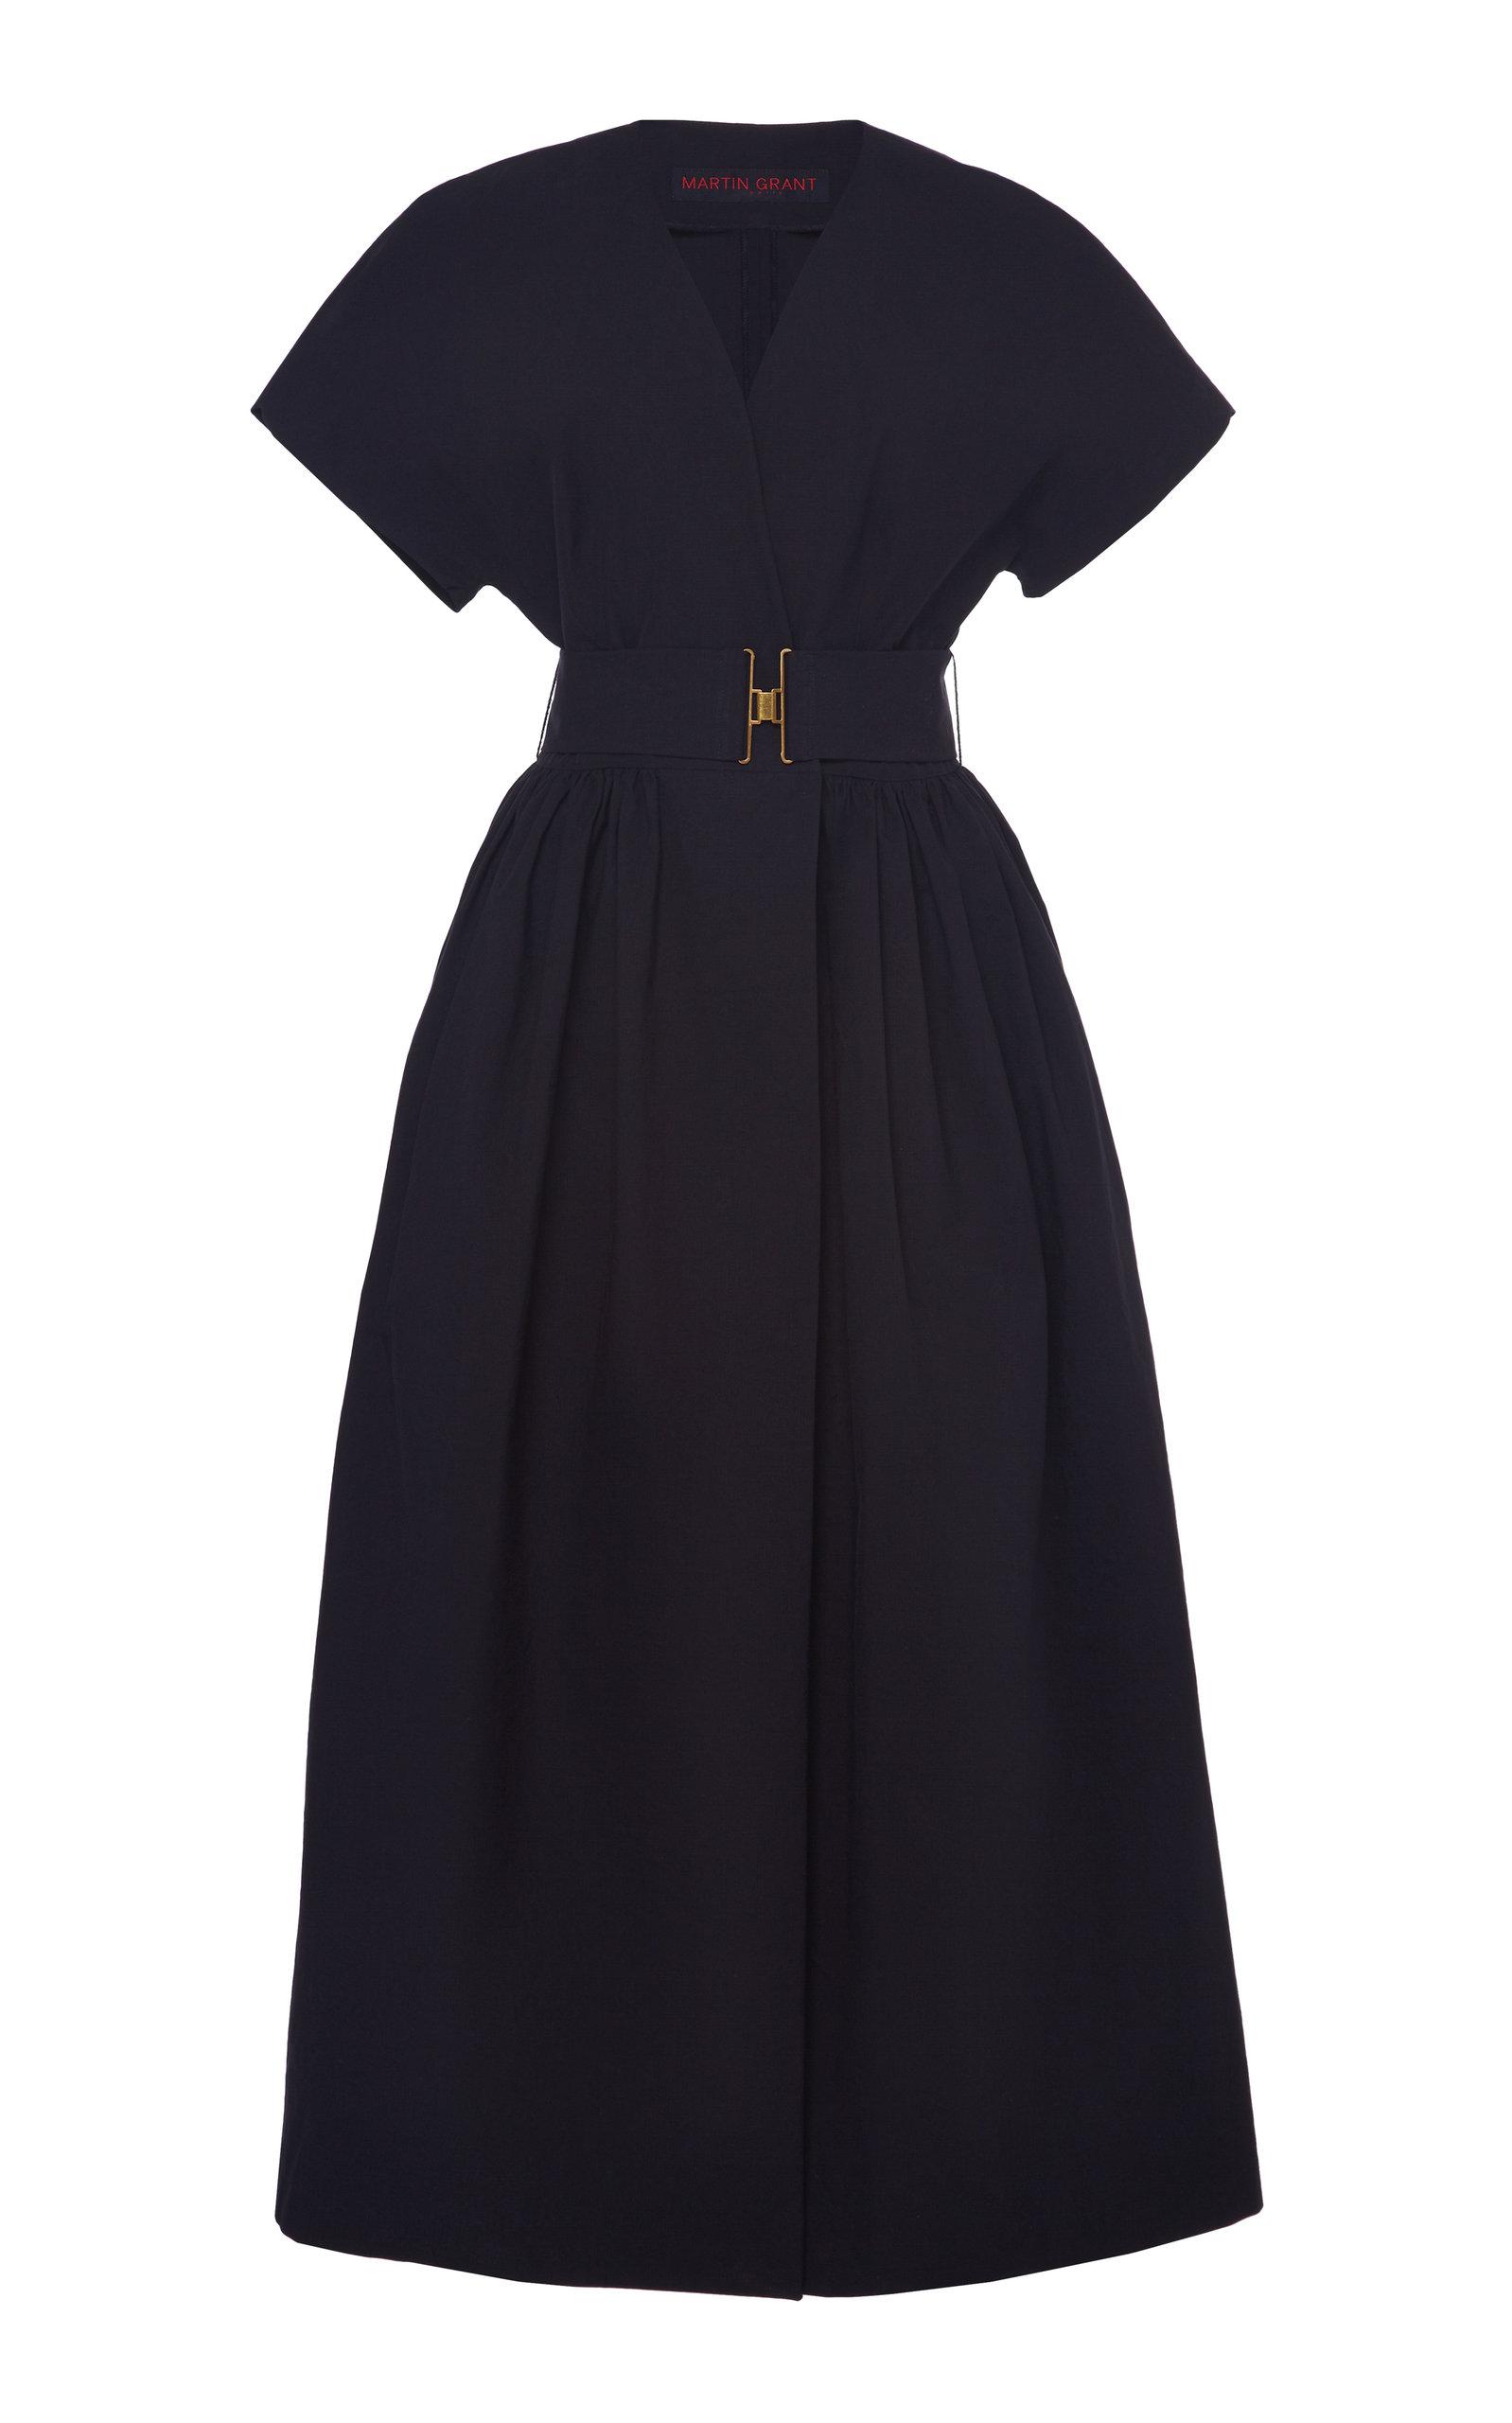 Buy Martin Grant Belted V-Neck Cotton Dress online, shop Martin Grant at the best price